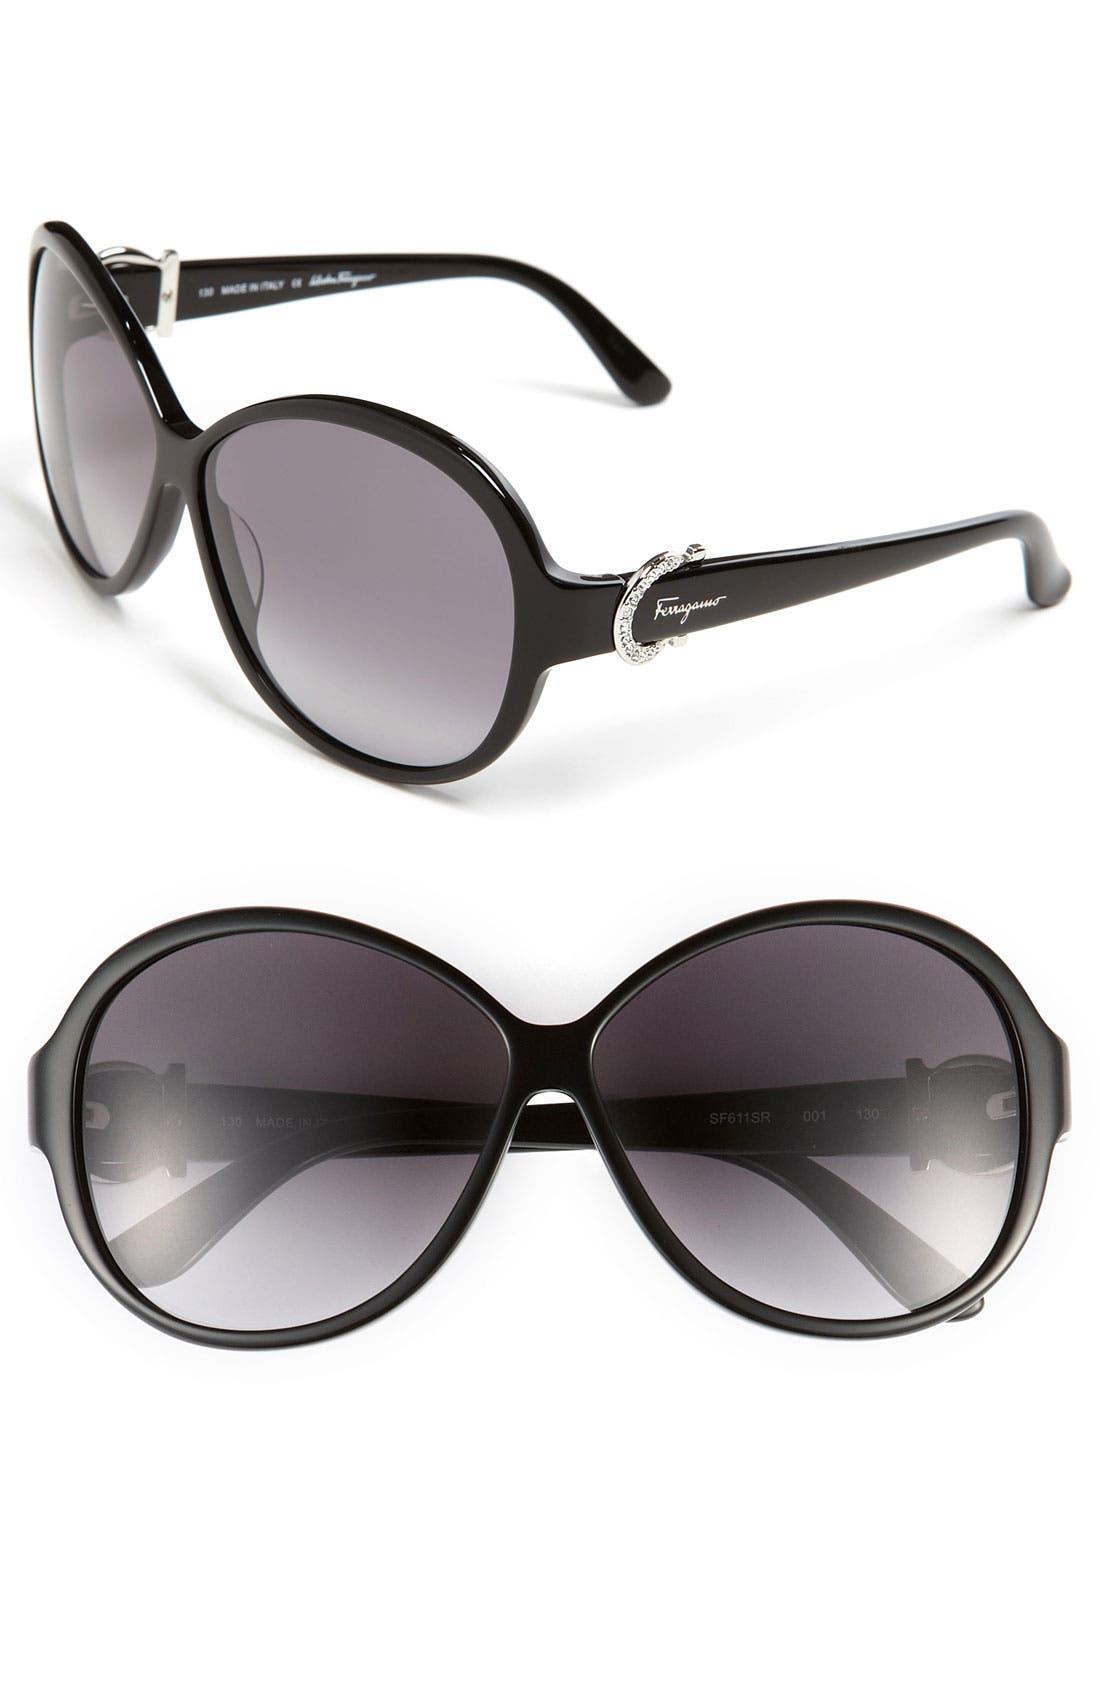 Main Image - Salvatore Ferragamo 59mm Classic Sunglasses